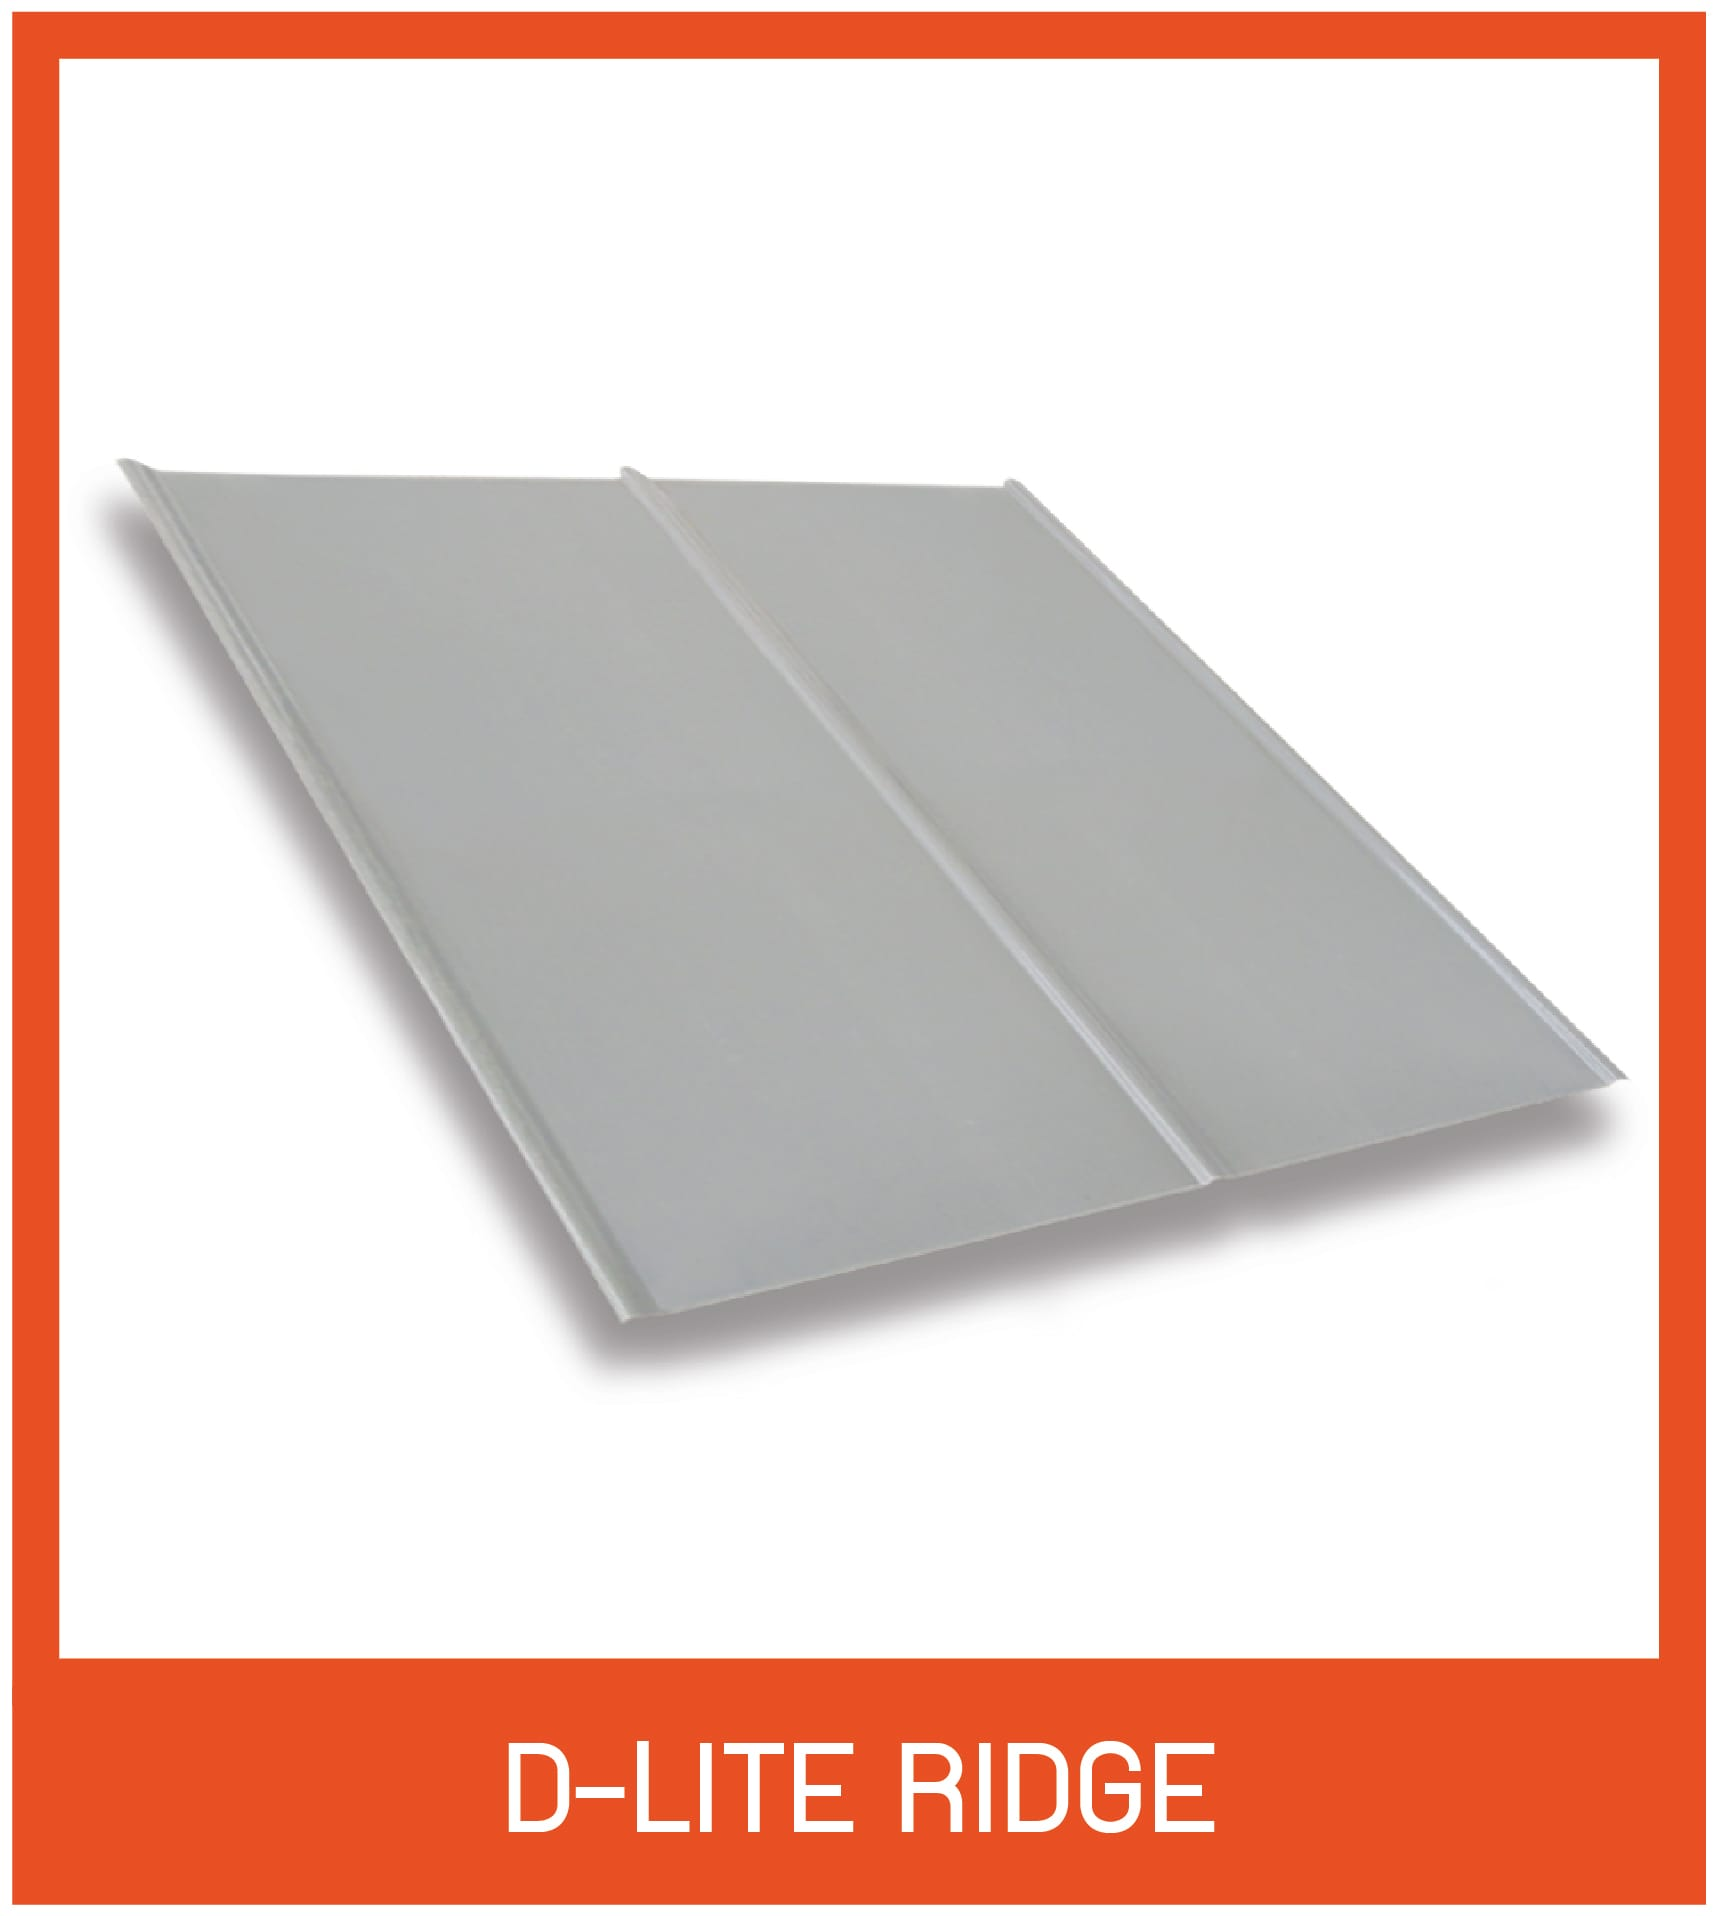 D-Lite-ridge กันสาดดีไลท์ ลอนเรียบ